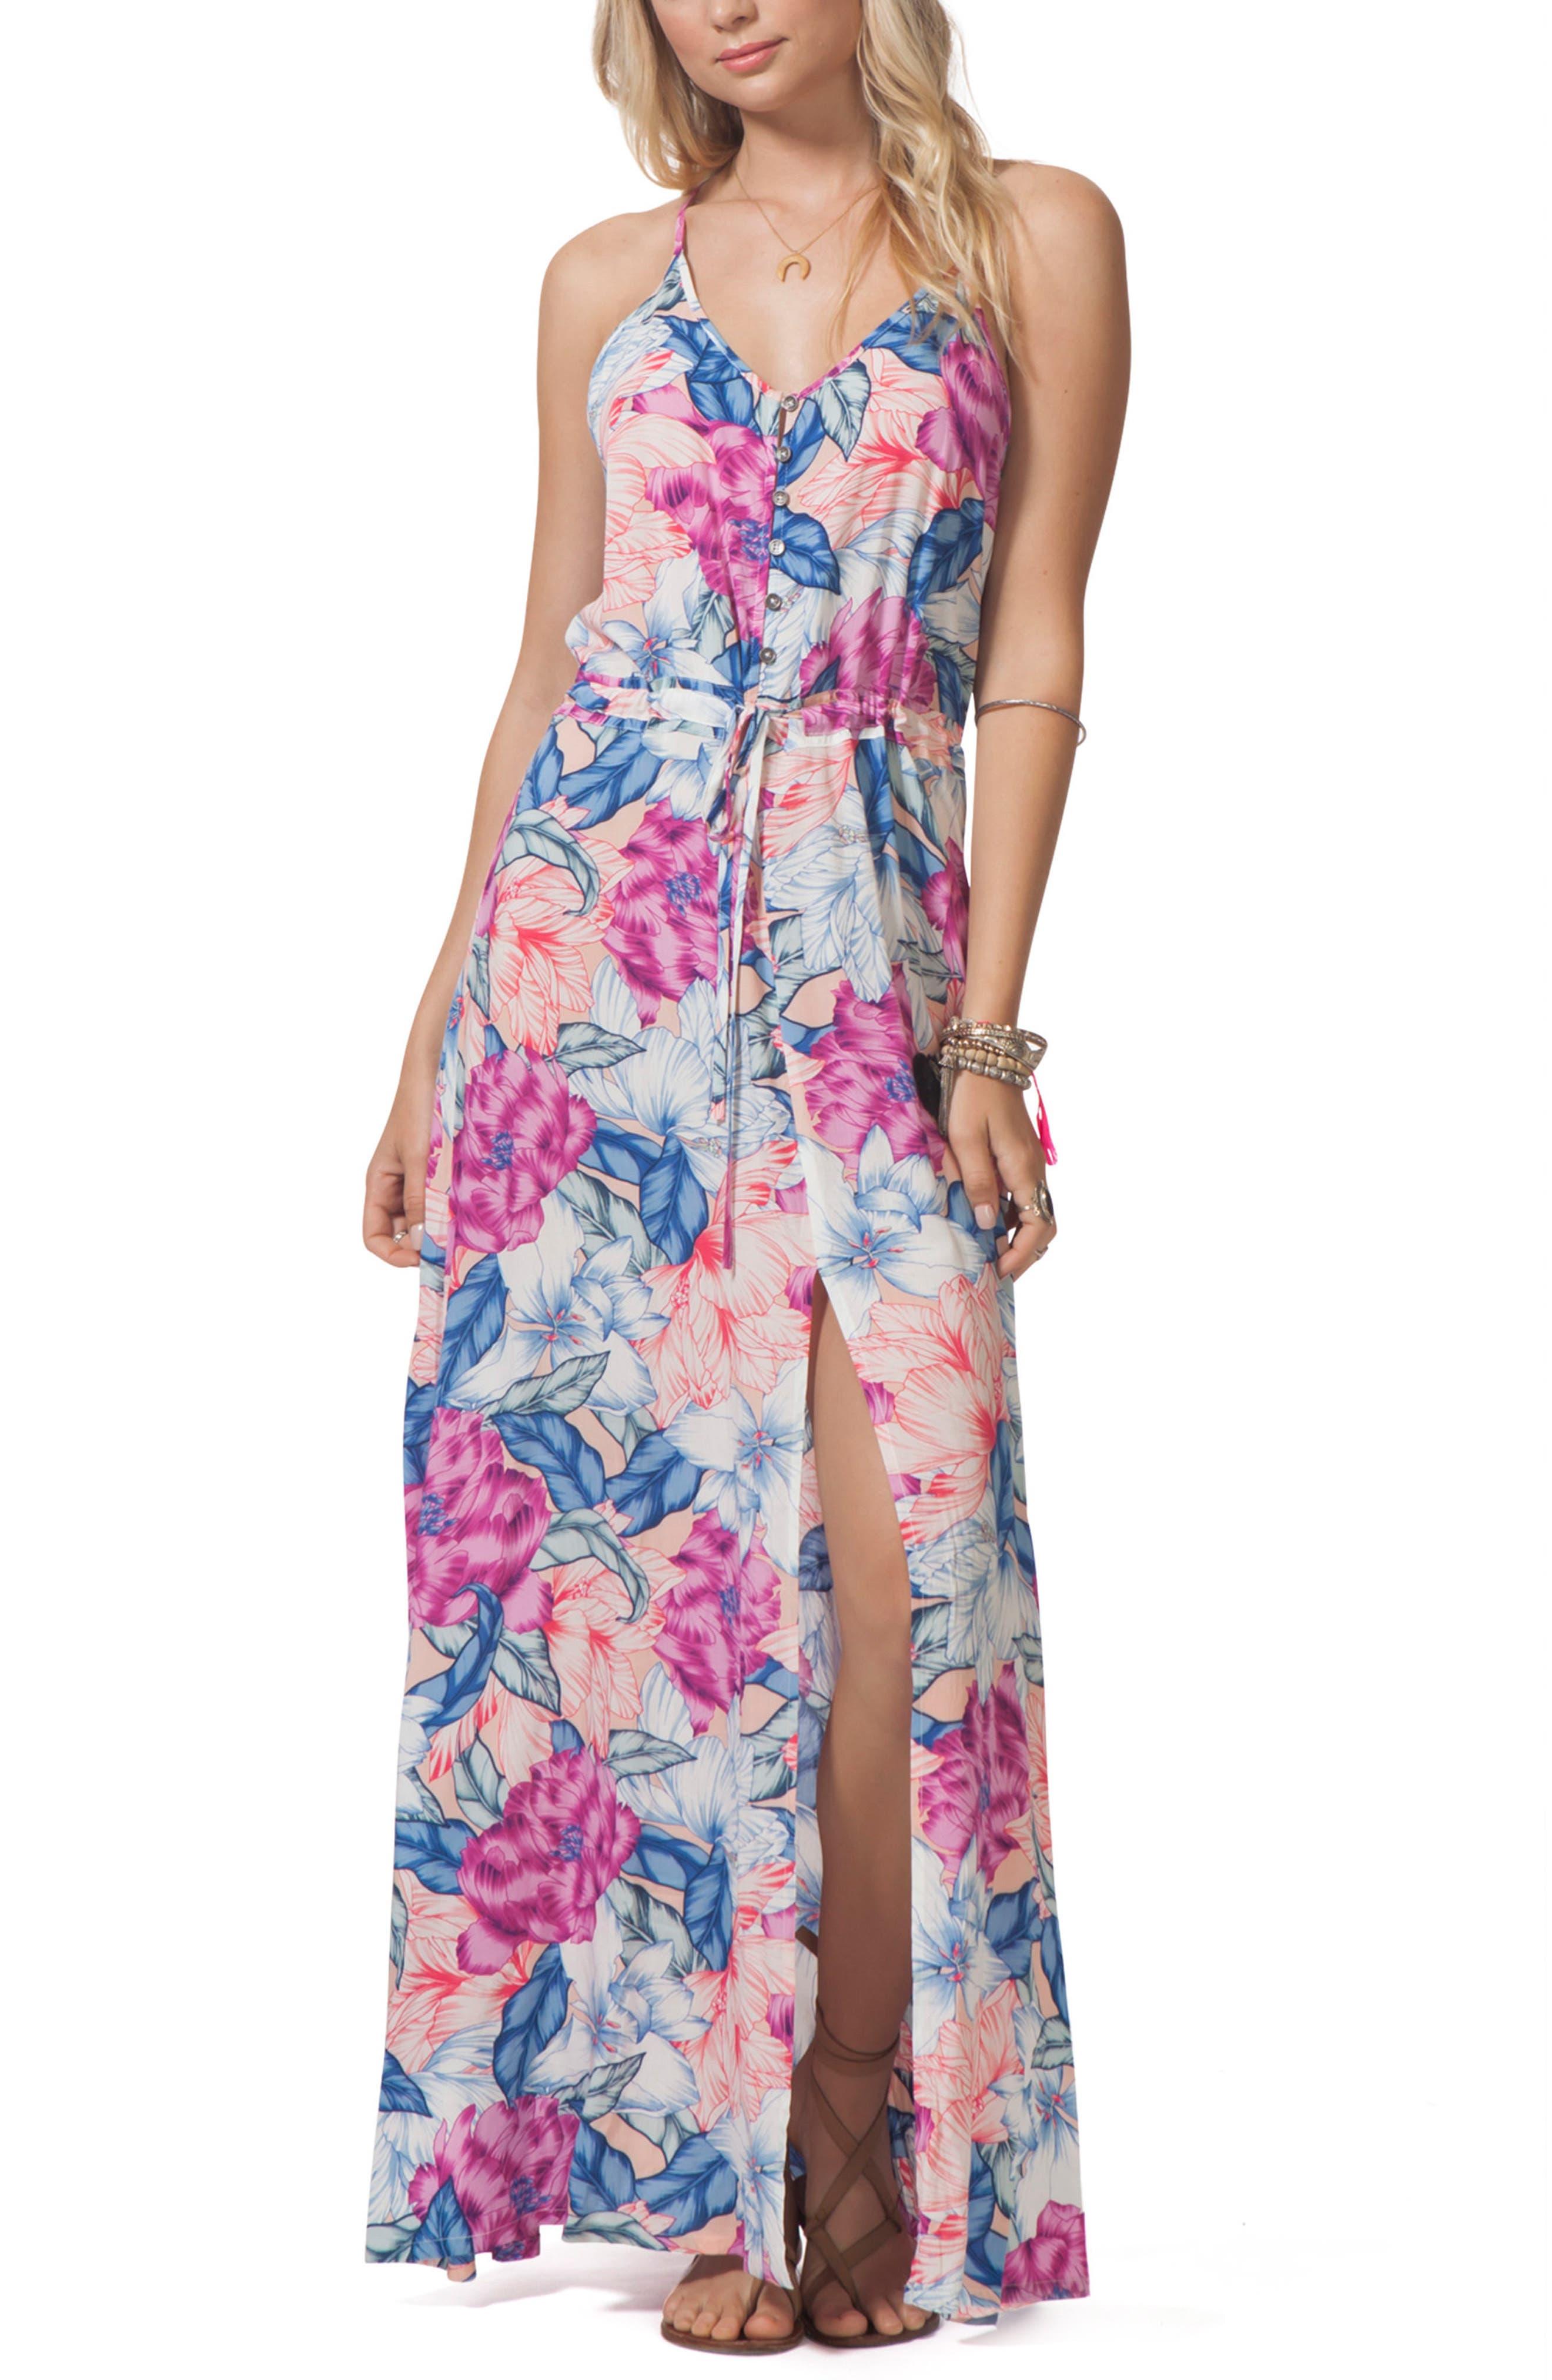 Rip Curl Floral Print Maxi Dress